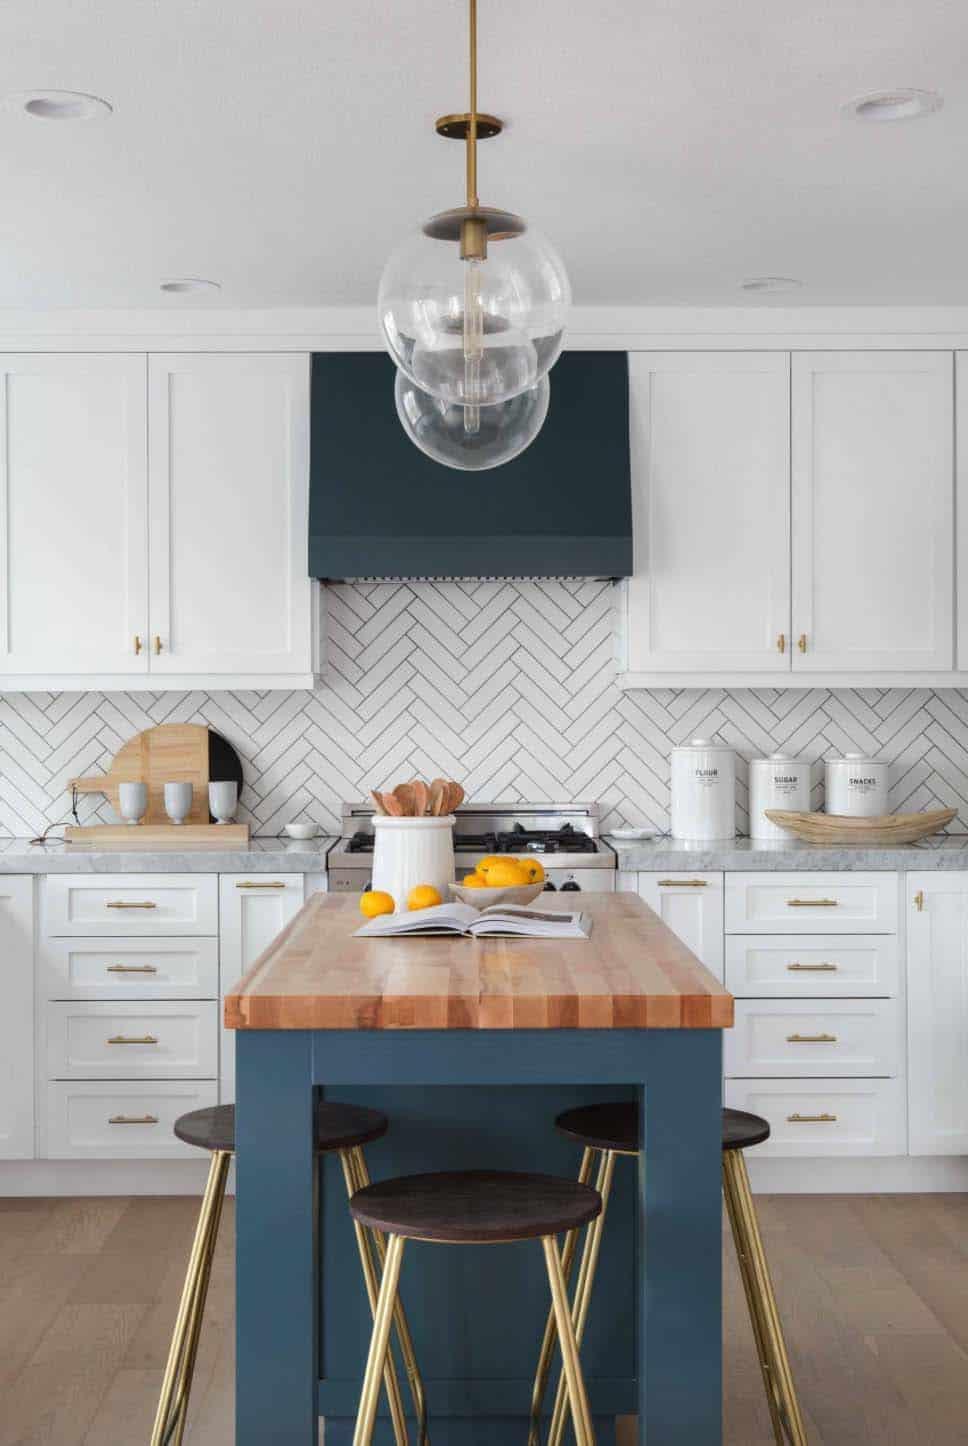 California Eclectic Home-Lindye Galloway Interiors-15-1 Kindesign